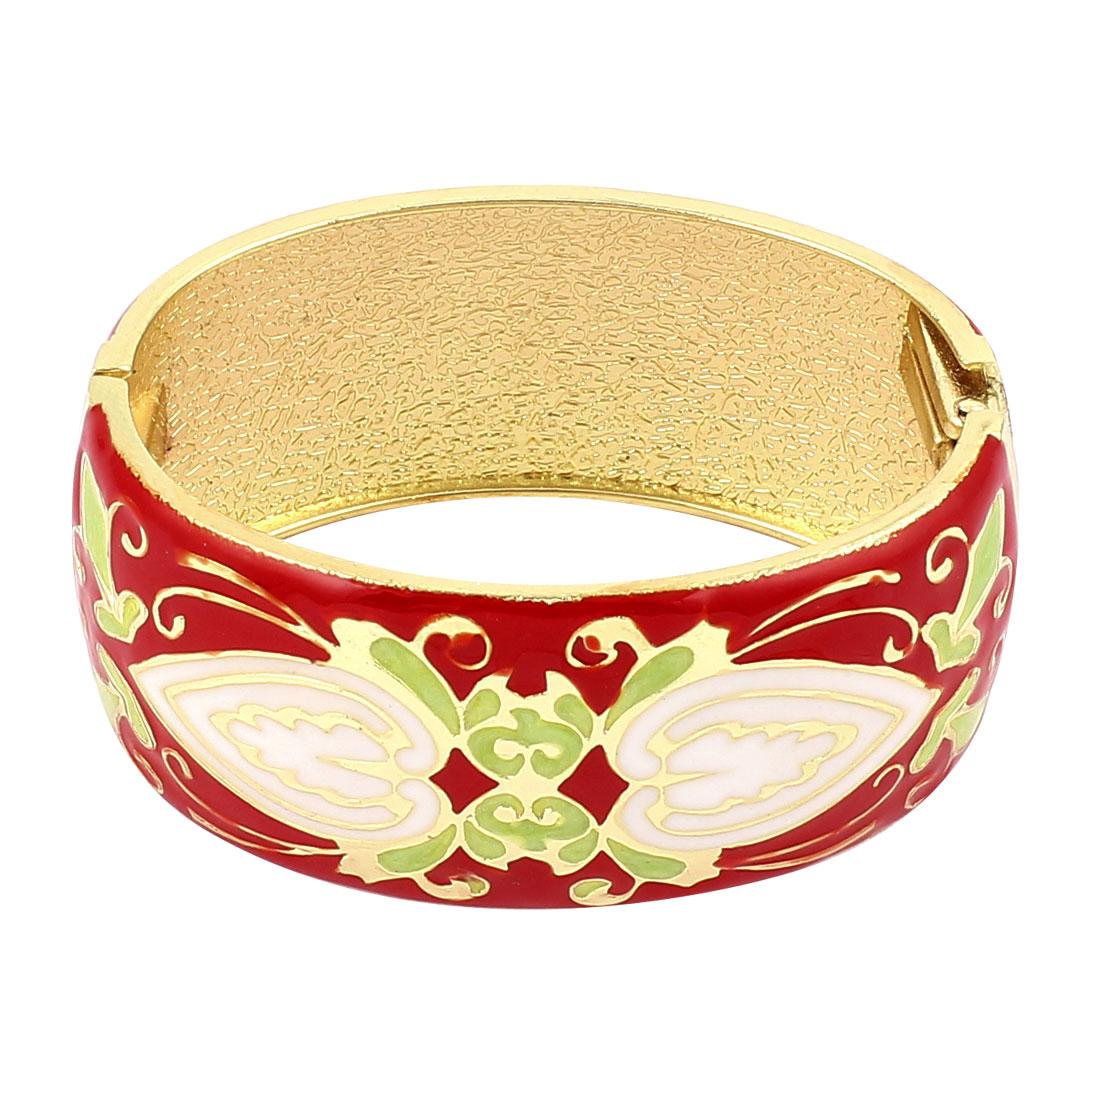 Lady Jewelry Floral Printed Metal Hinge Wrist Enamel Bracelet Bangle Red